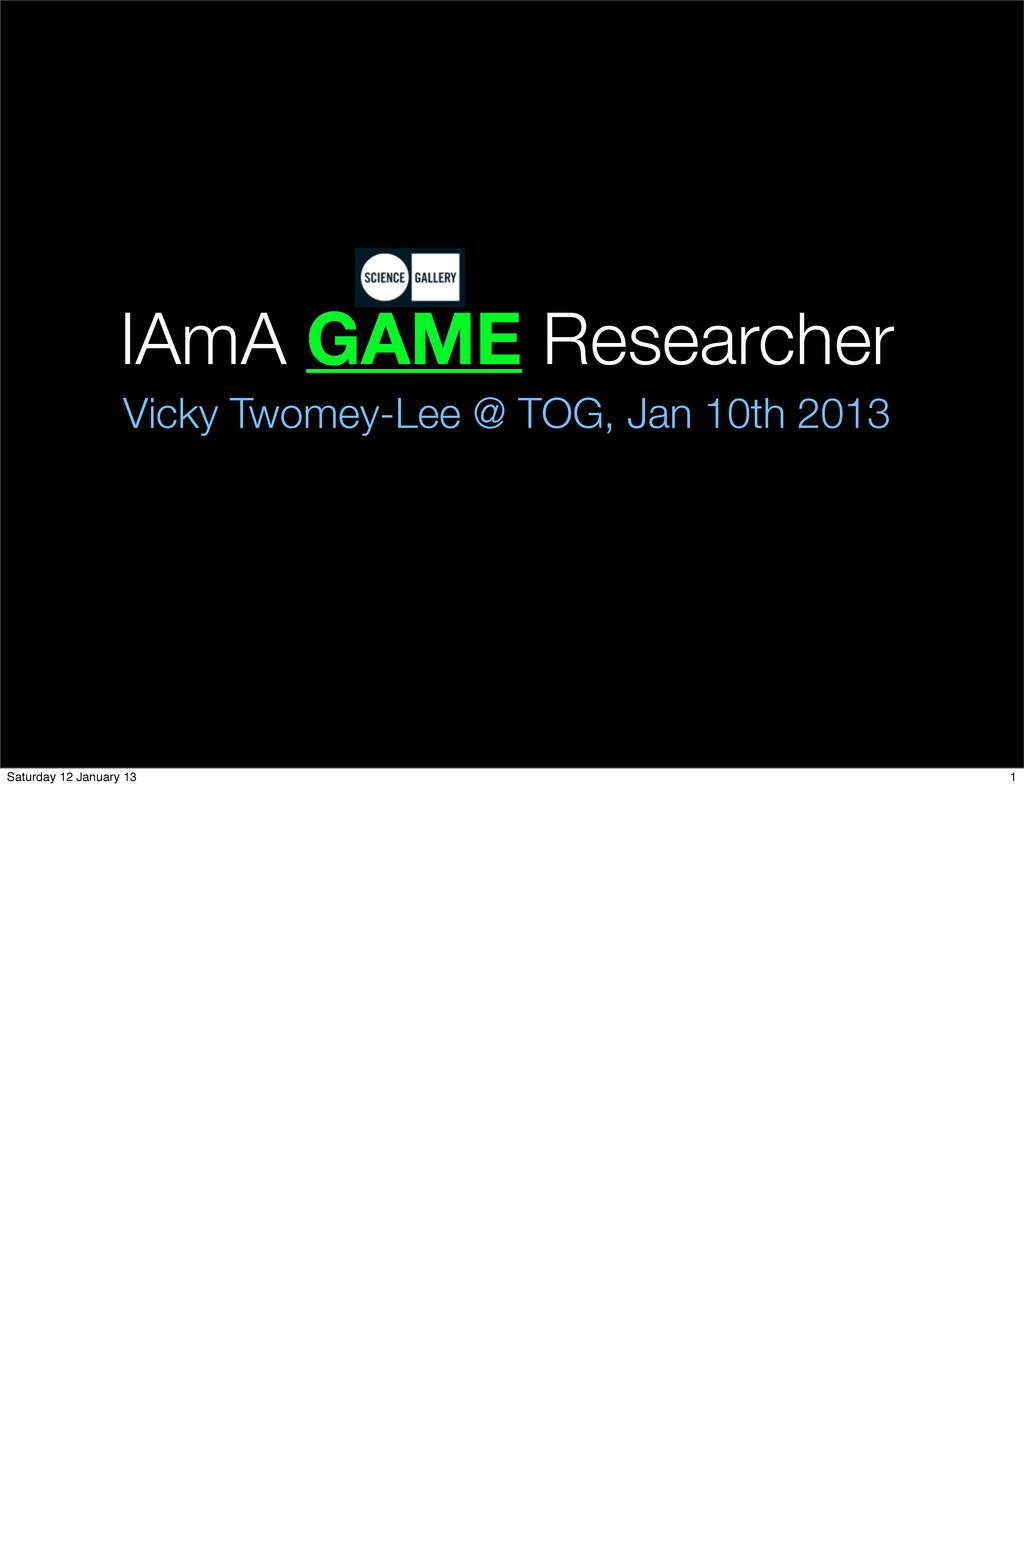 IAmA GAME Researcher Vicky Twomey-Lee @ TOG, Ja...